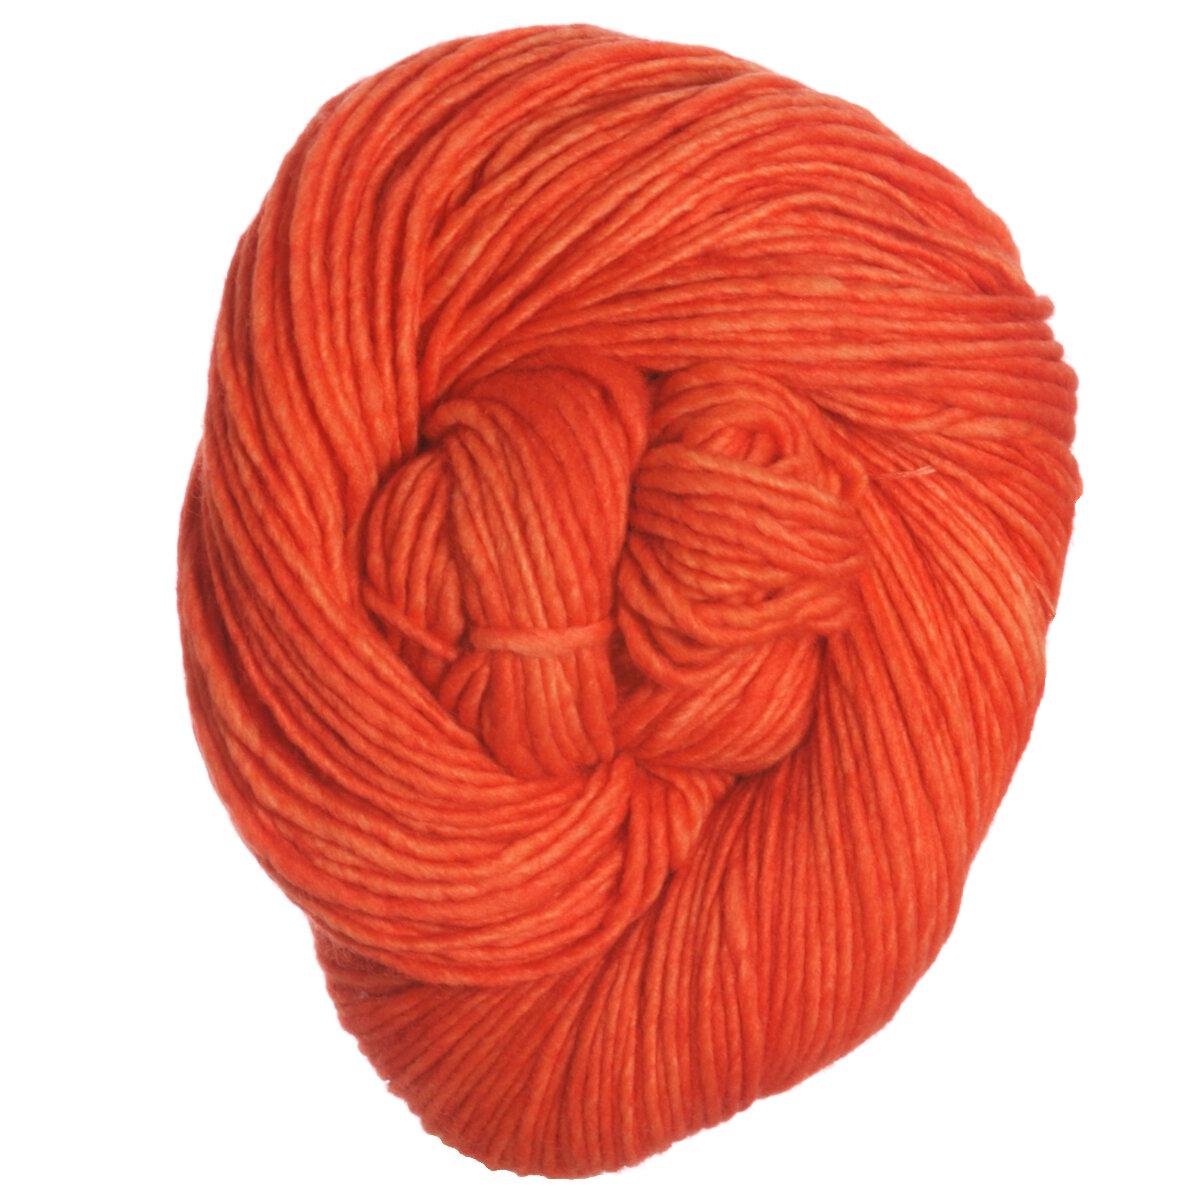 Worsted Yarn : Malabrigo Worsted Merino Yarn - 152 - Tiger Lily at Jimmy Beans Wool